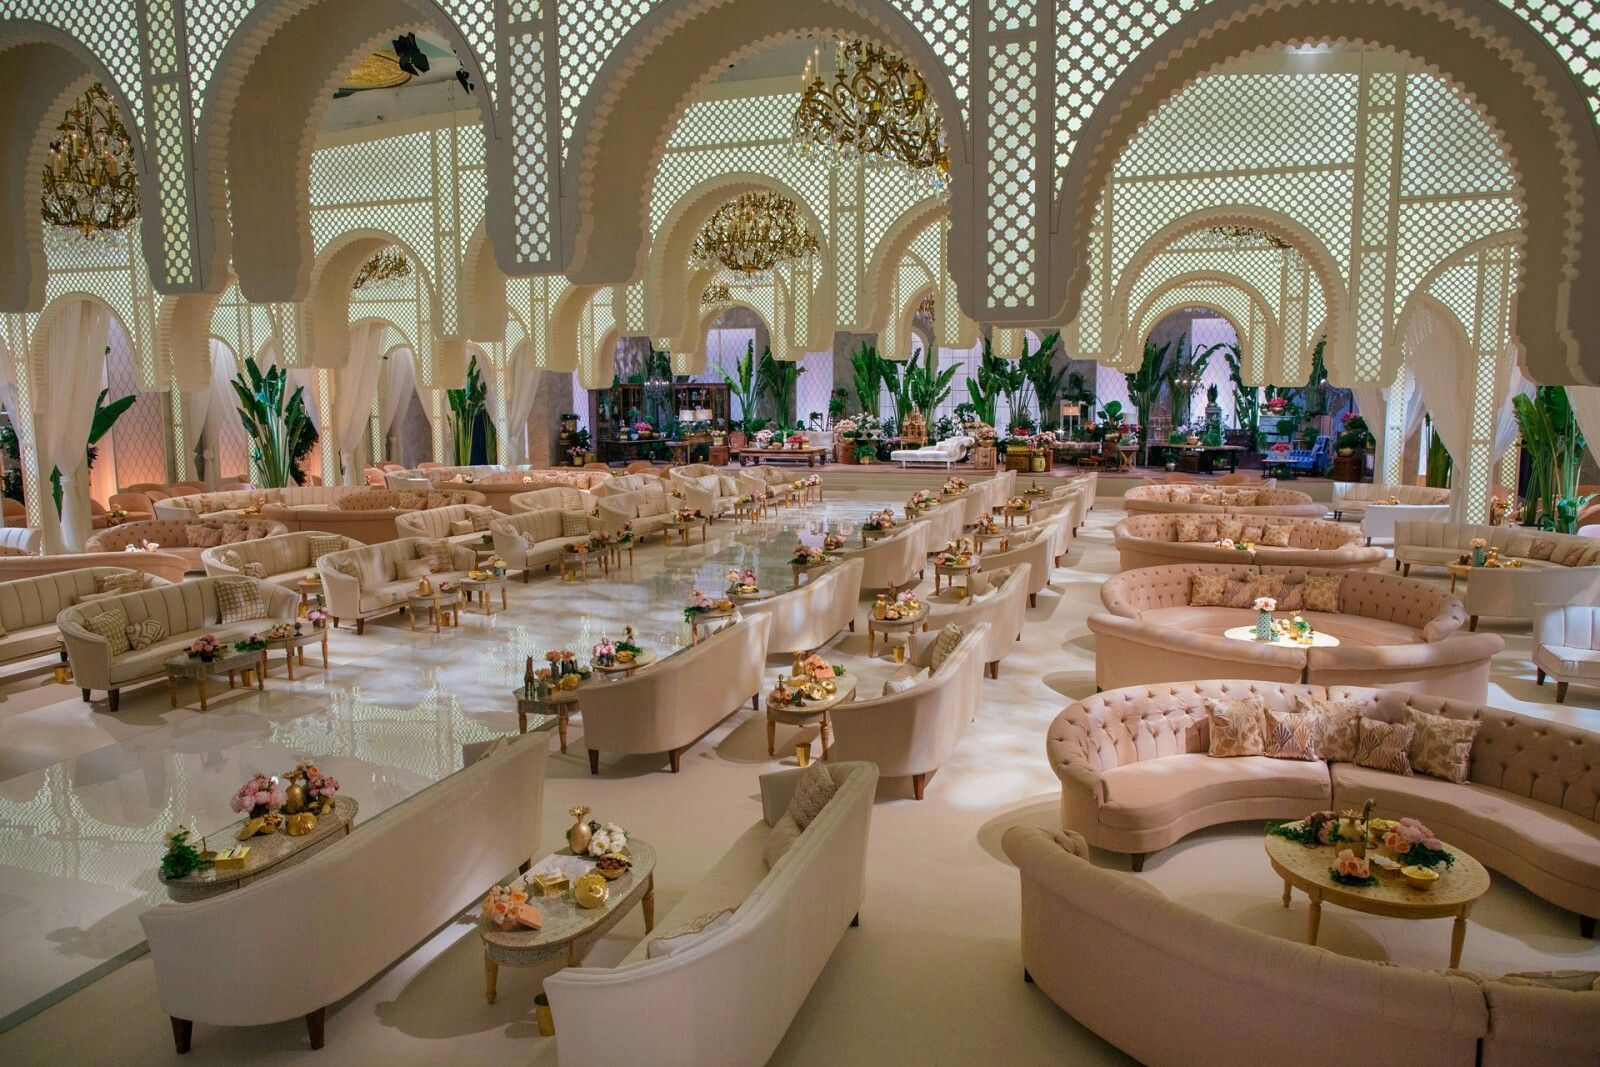 North beach plantation weddings  Pin by AL KASS on Events  Pinterest